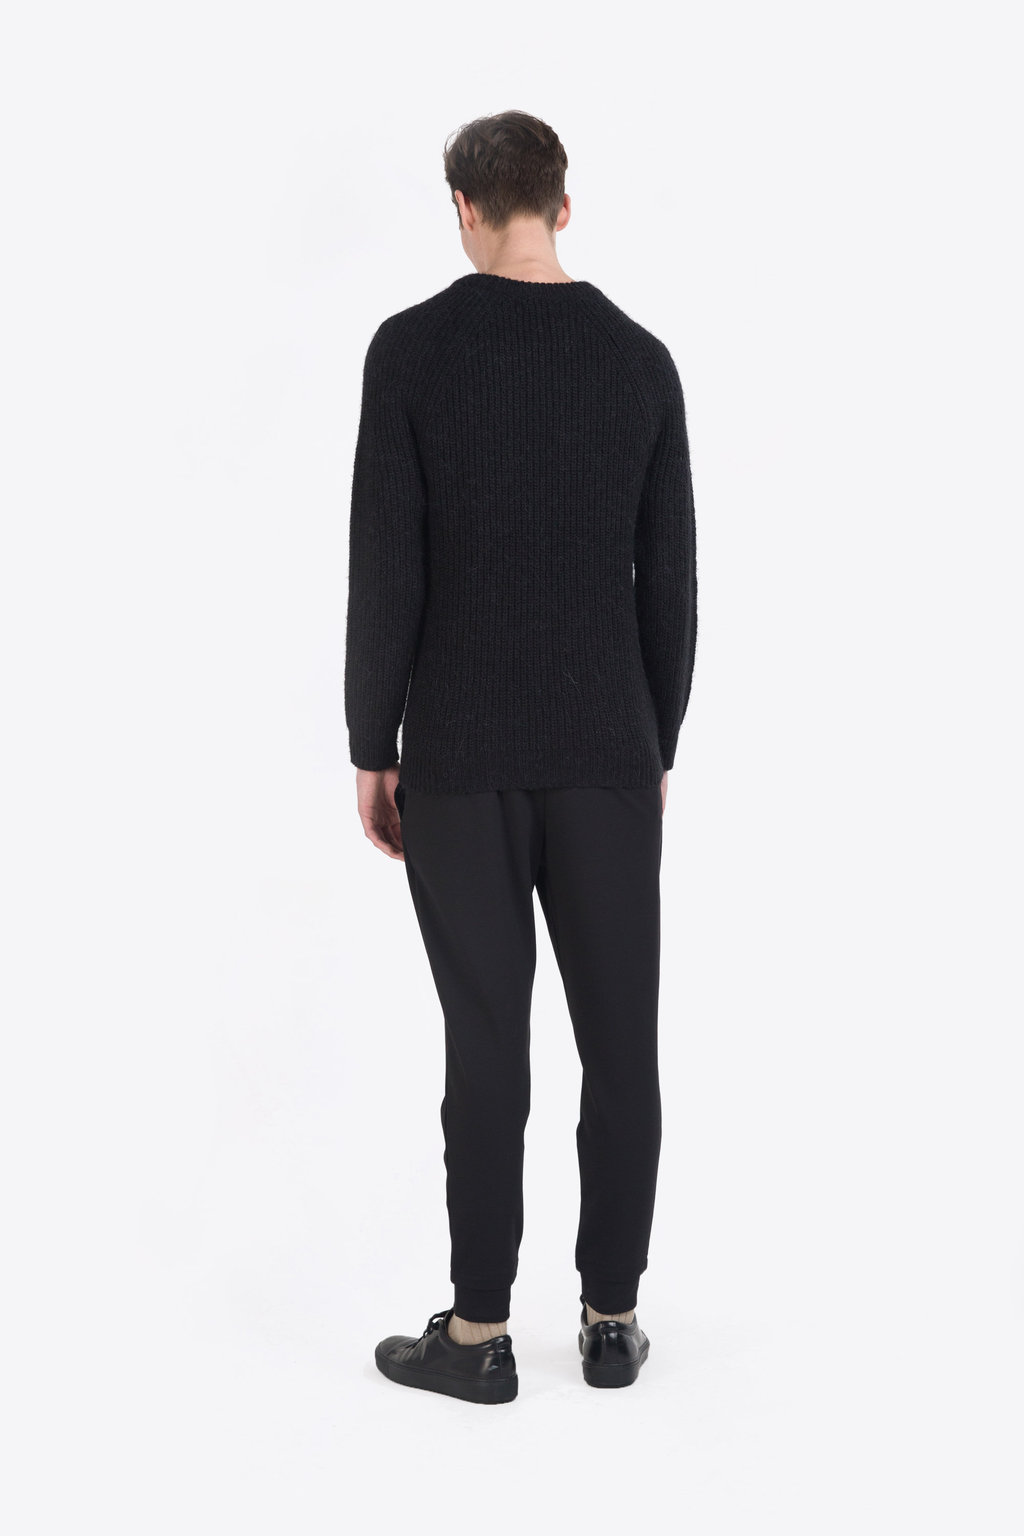 Sweater 7234 Black 2